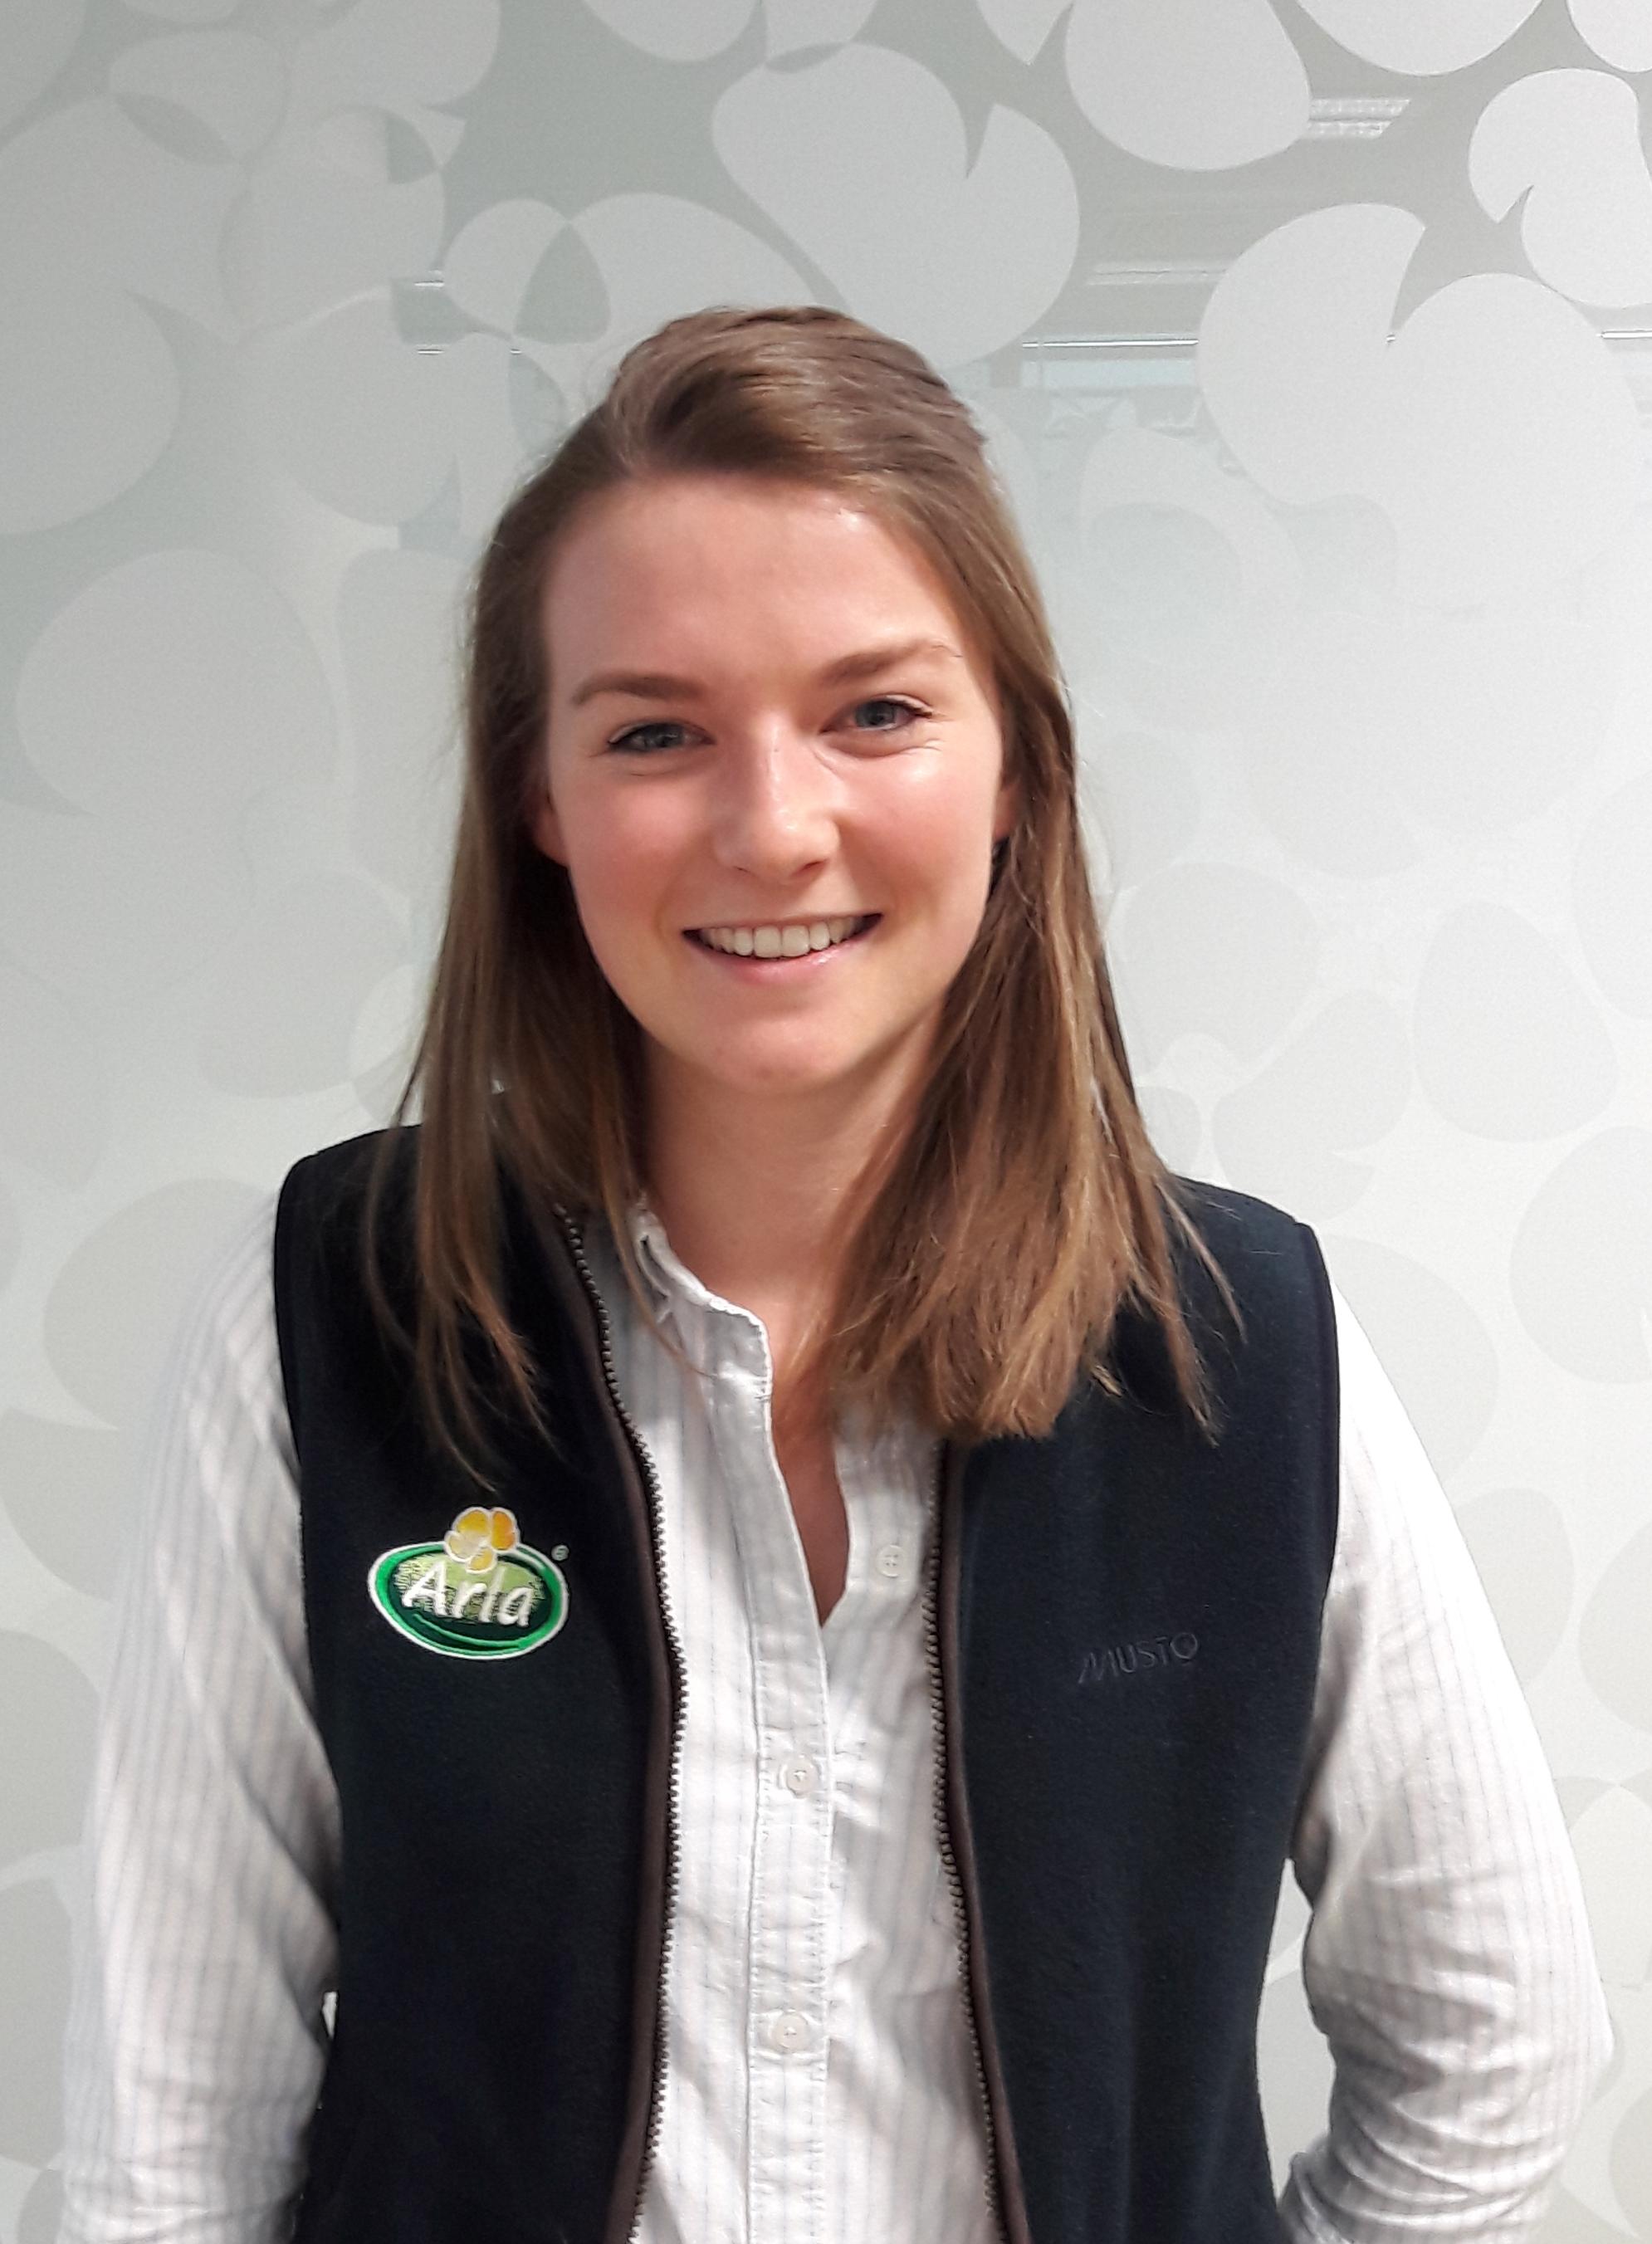 Kate Liversidge